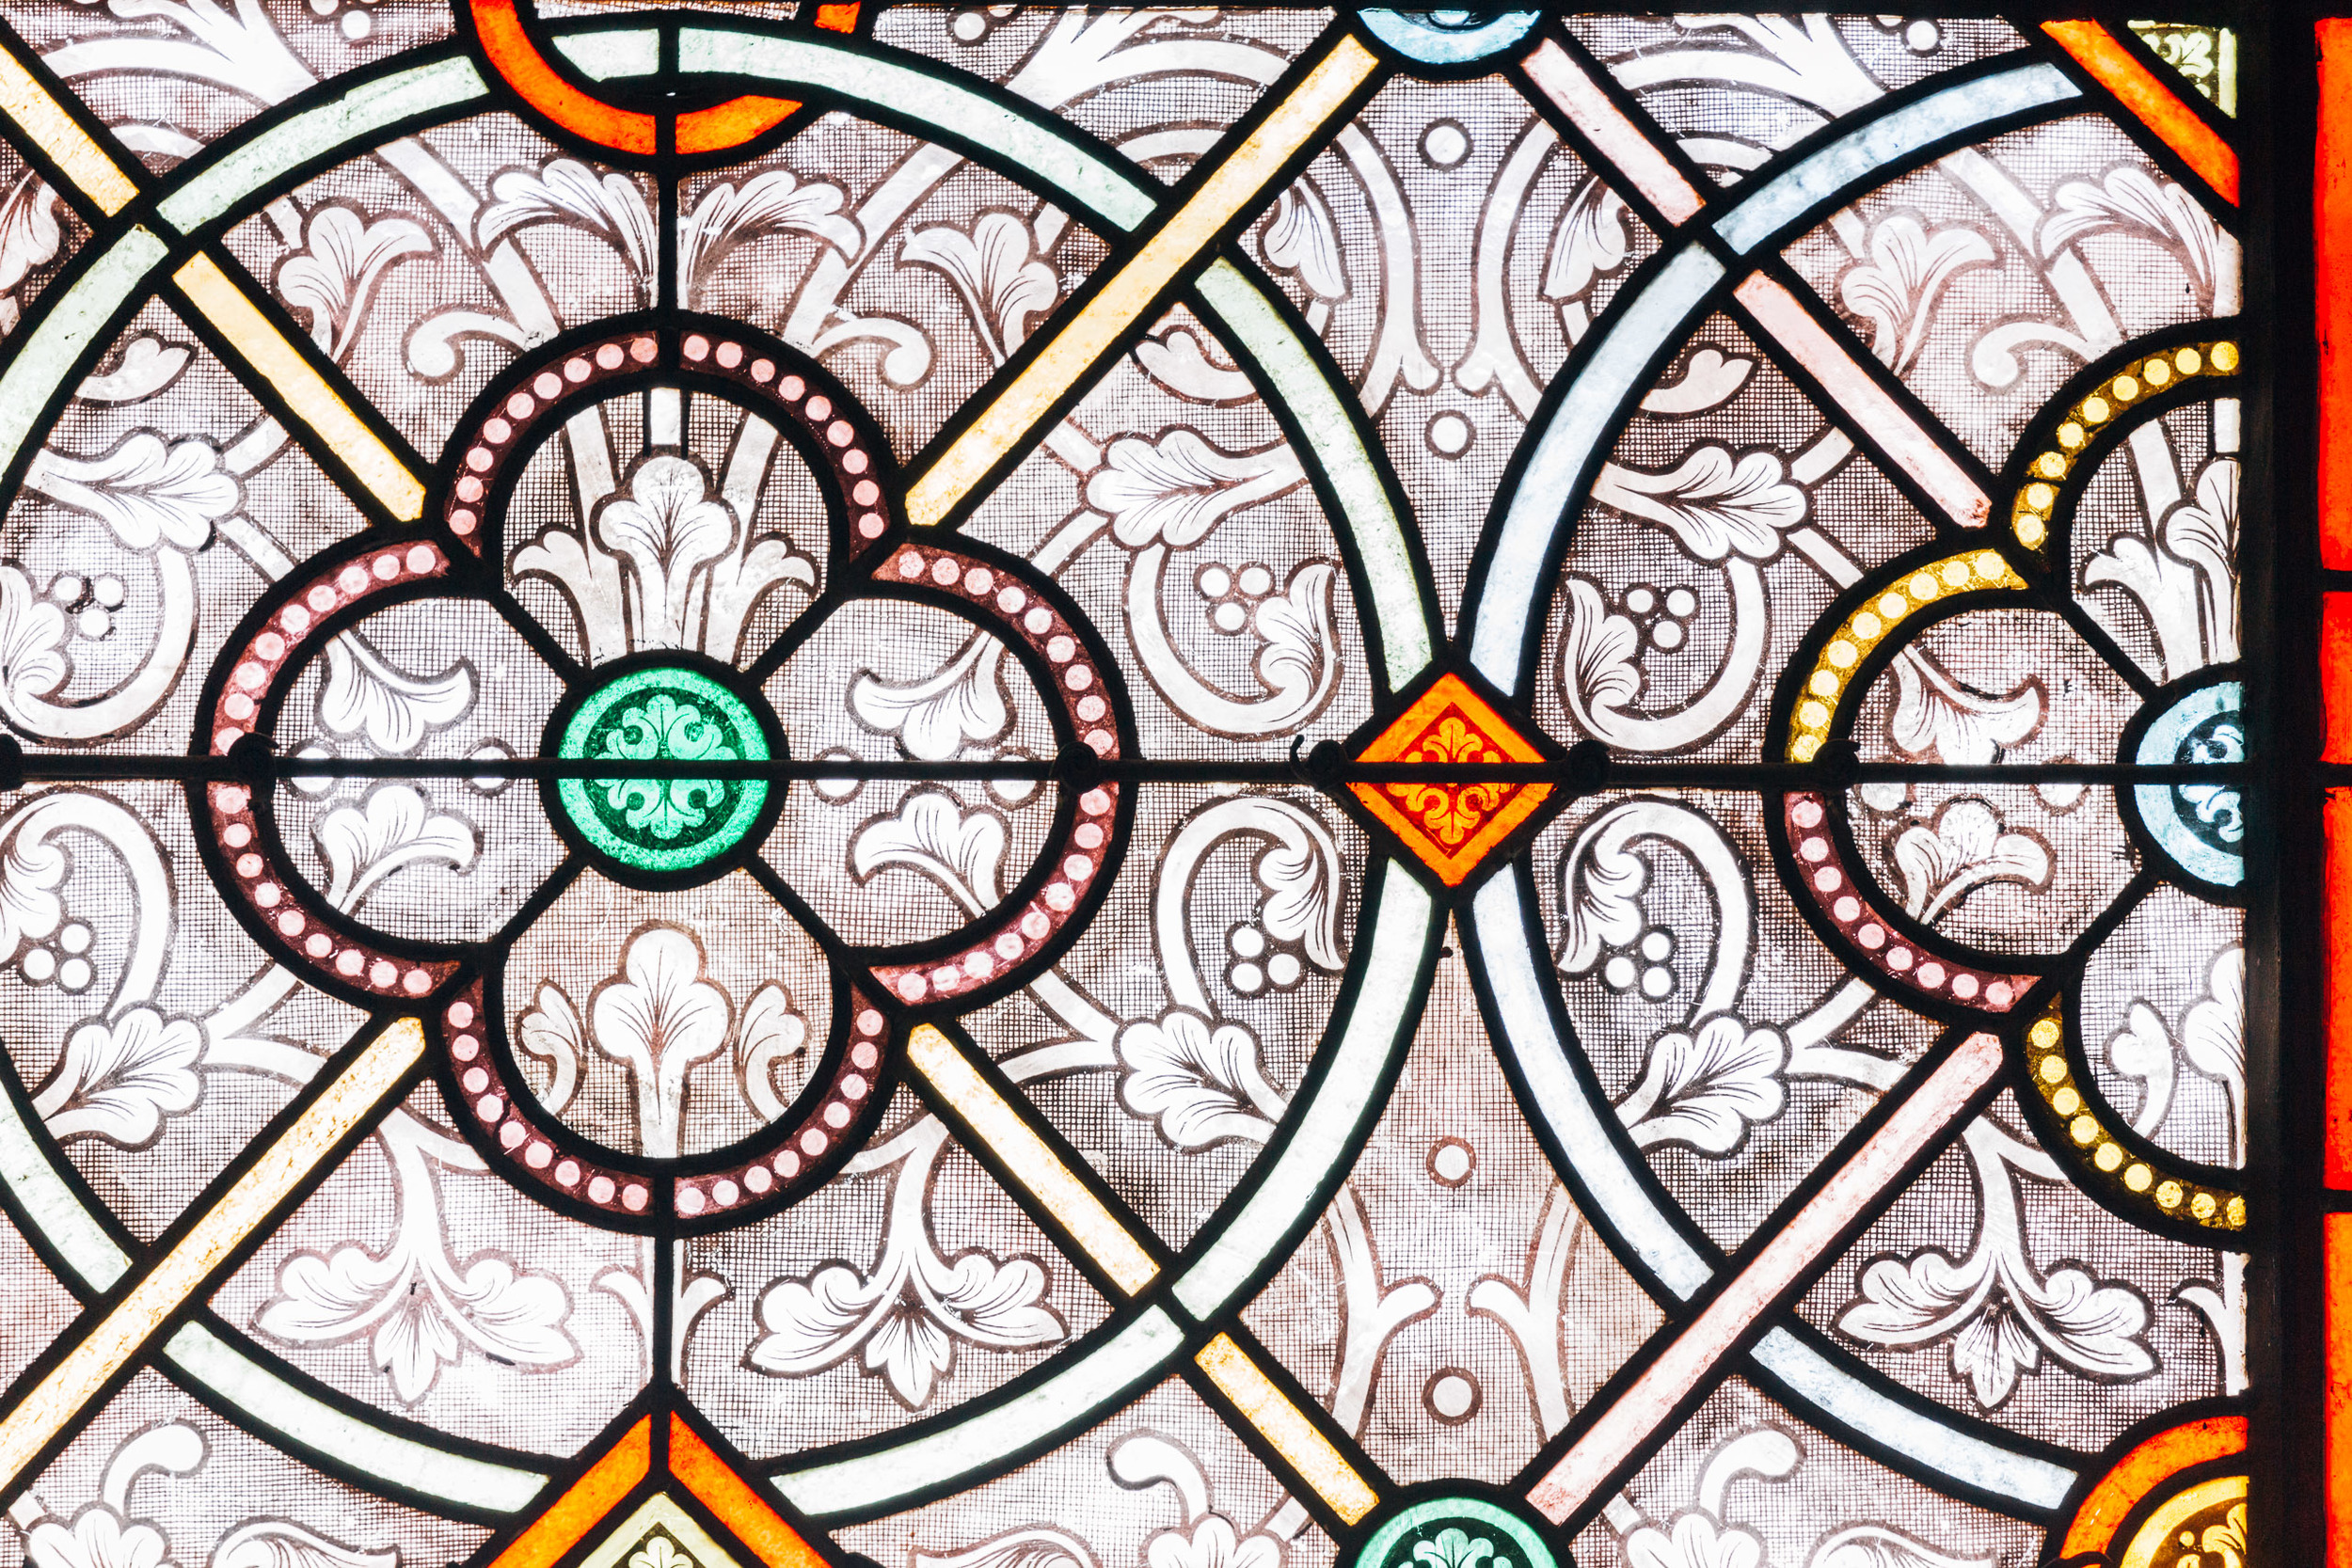 Chapelle Ecole Saint-Genevieve-36-2.jpg